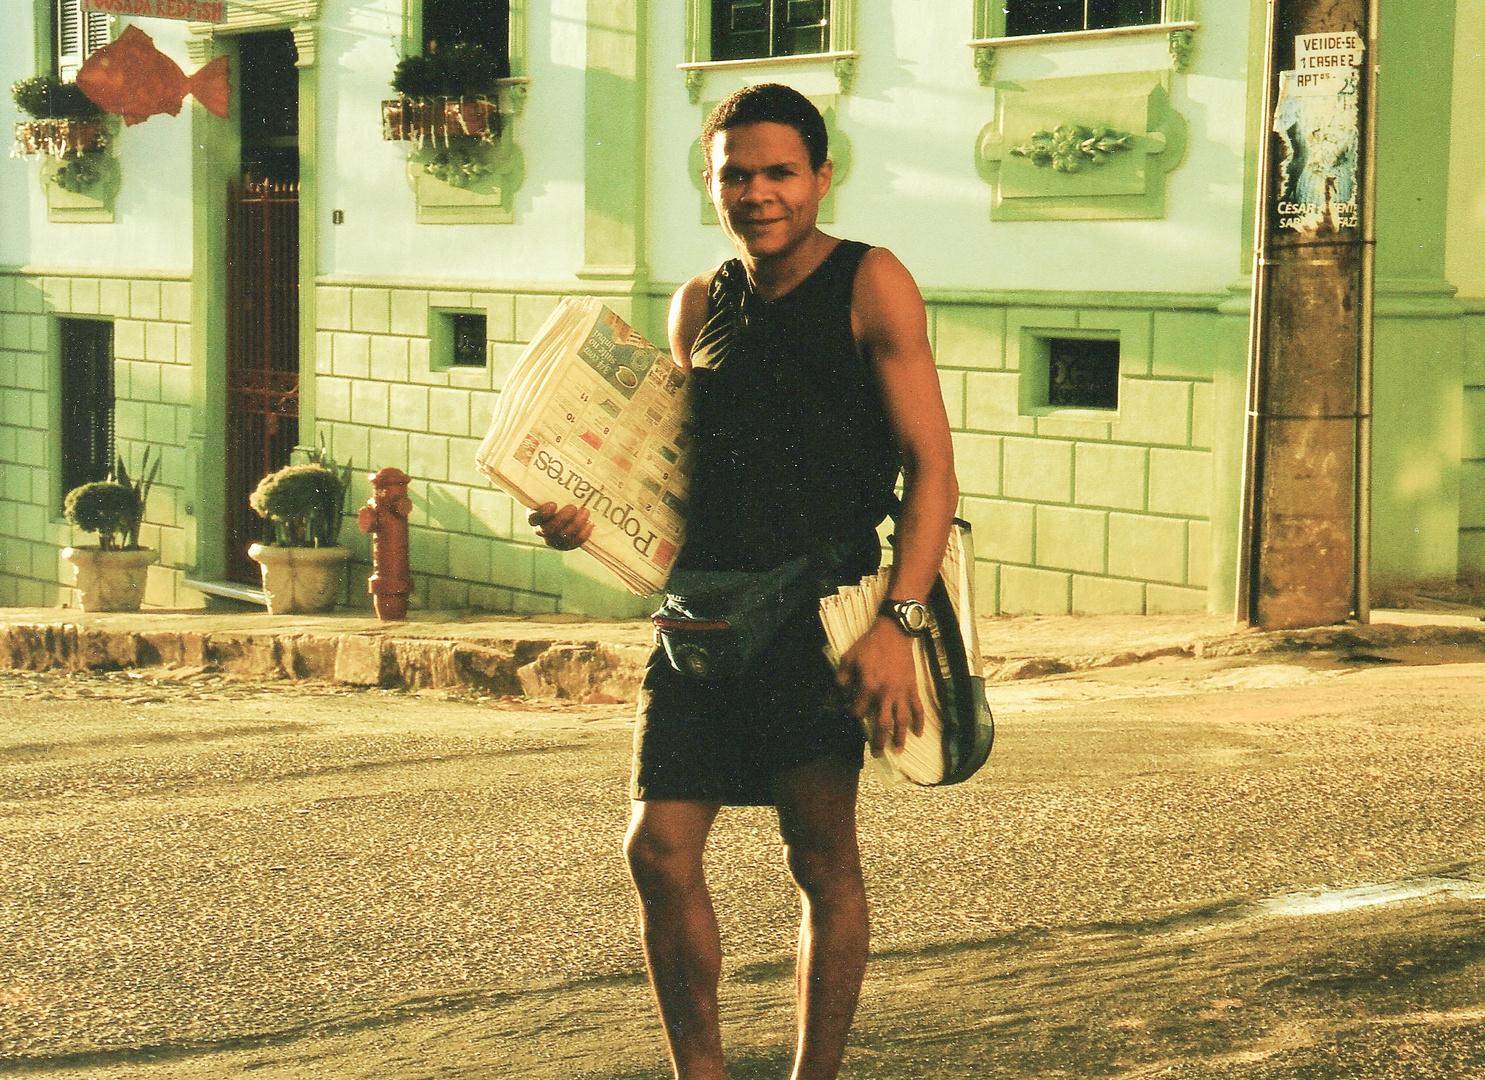 street Mann sunrise Brasil fc-Startbild +REISEFOTOS